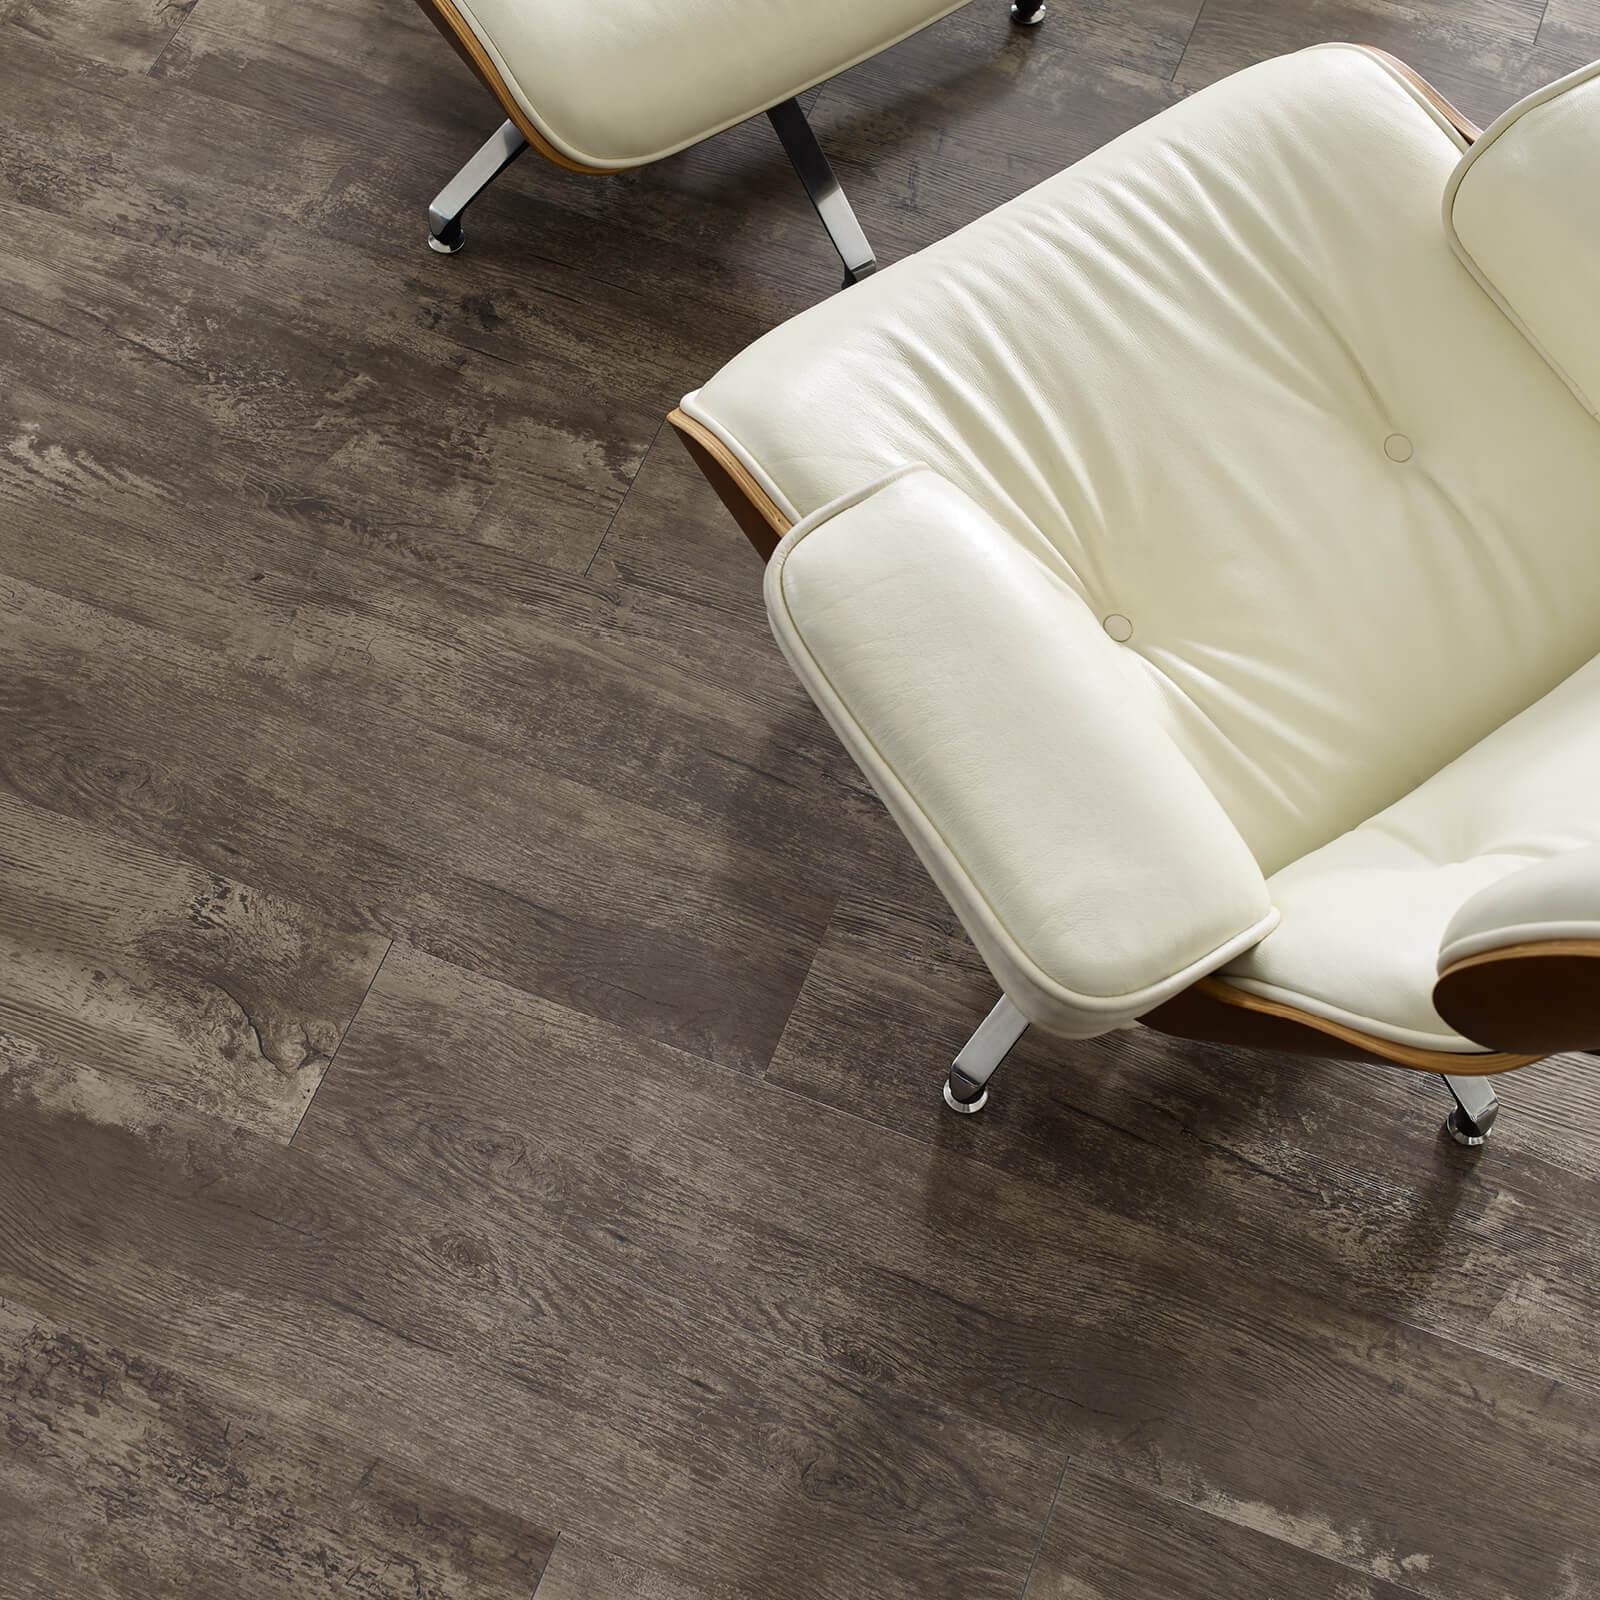 Laminate flooring | McSwain Carpet & Floors